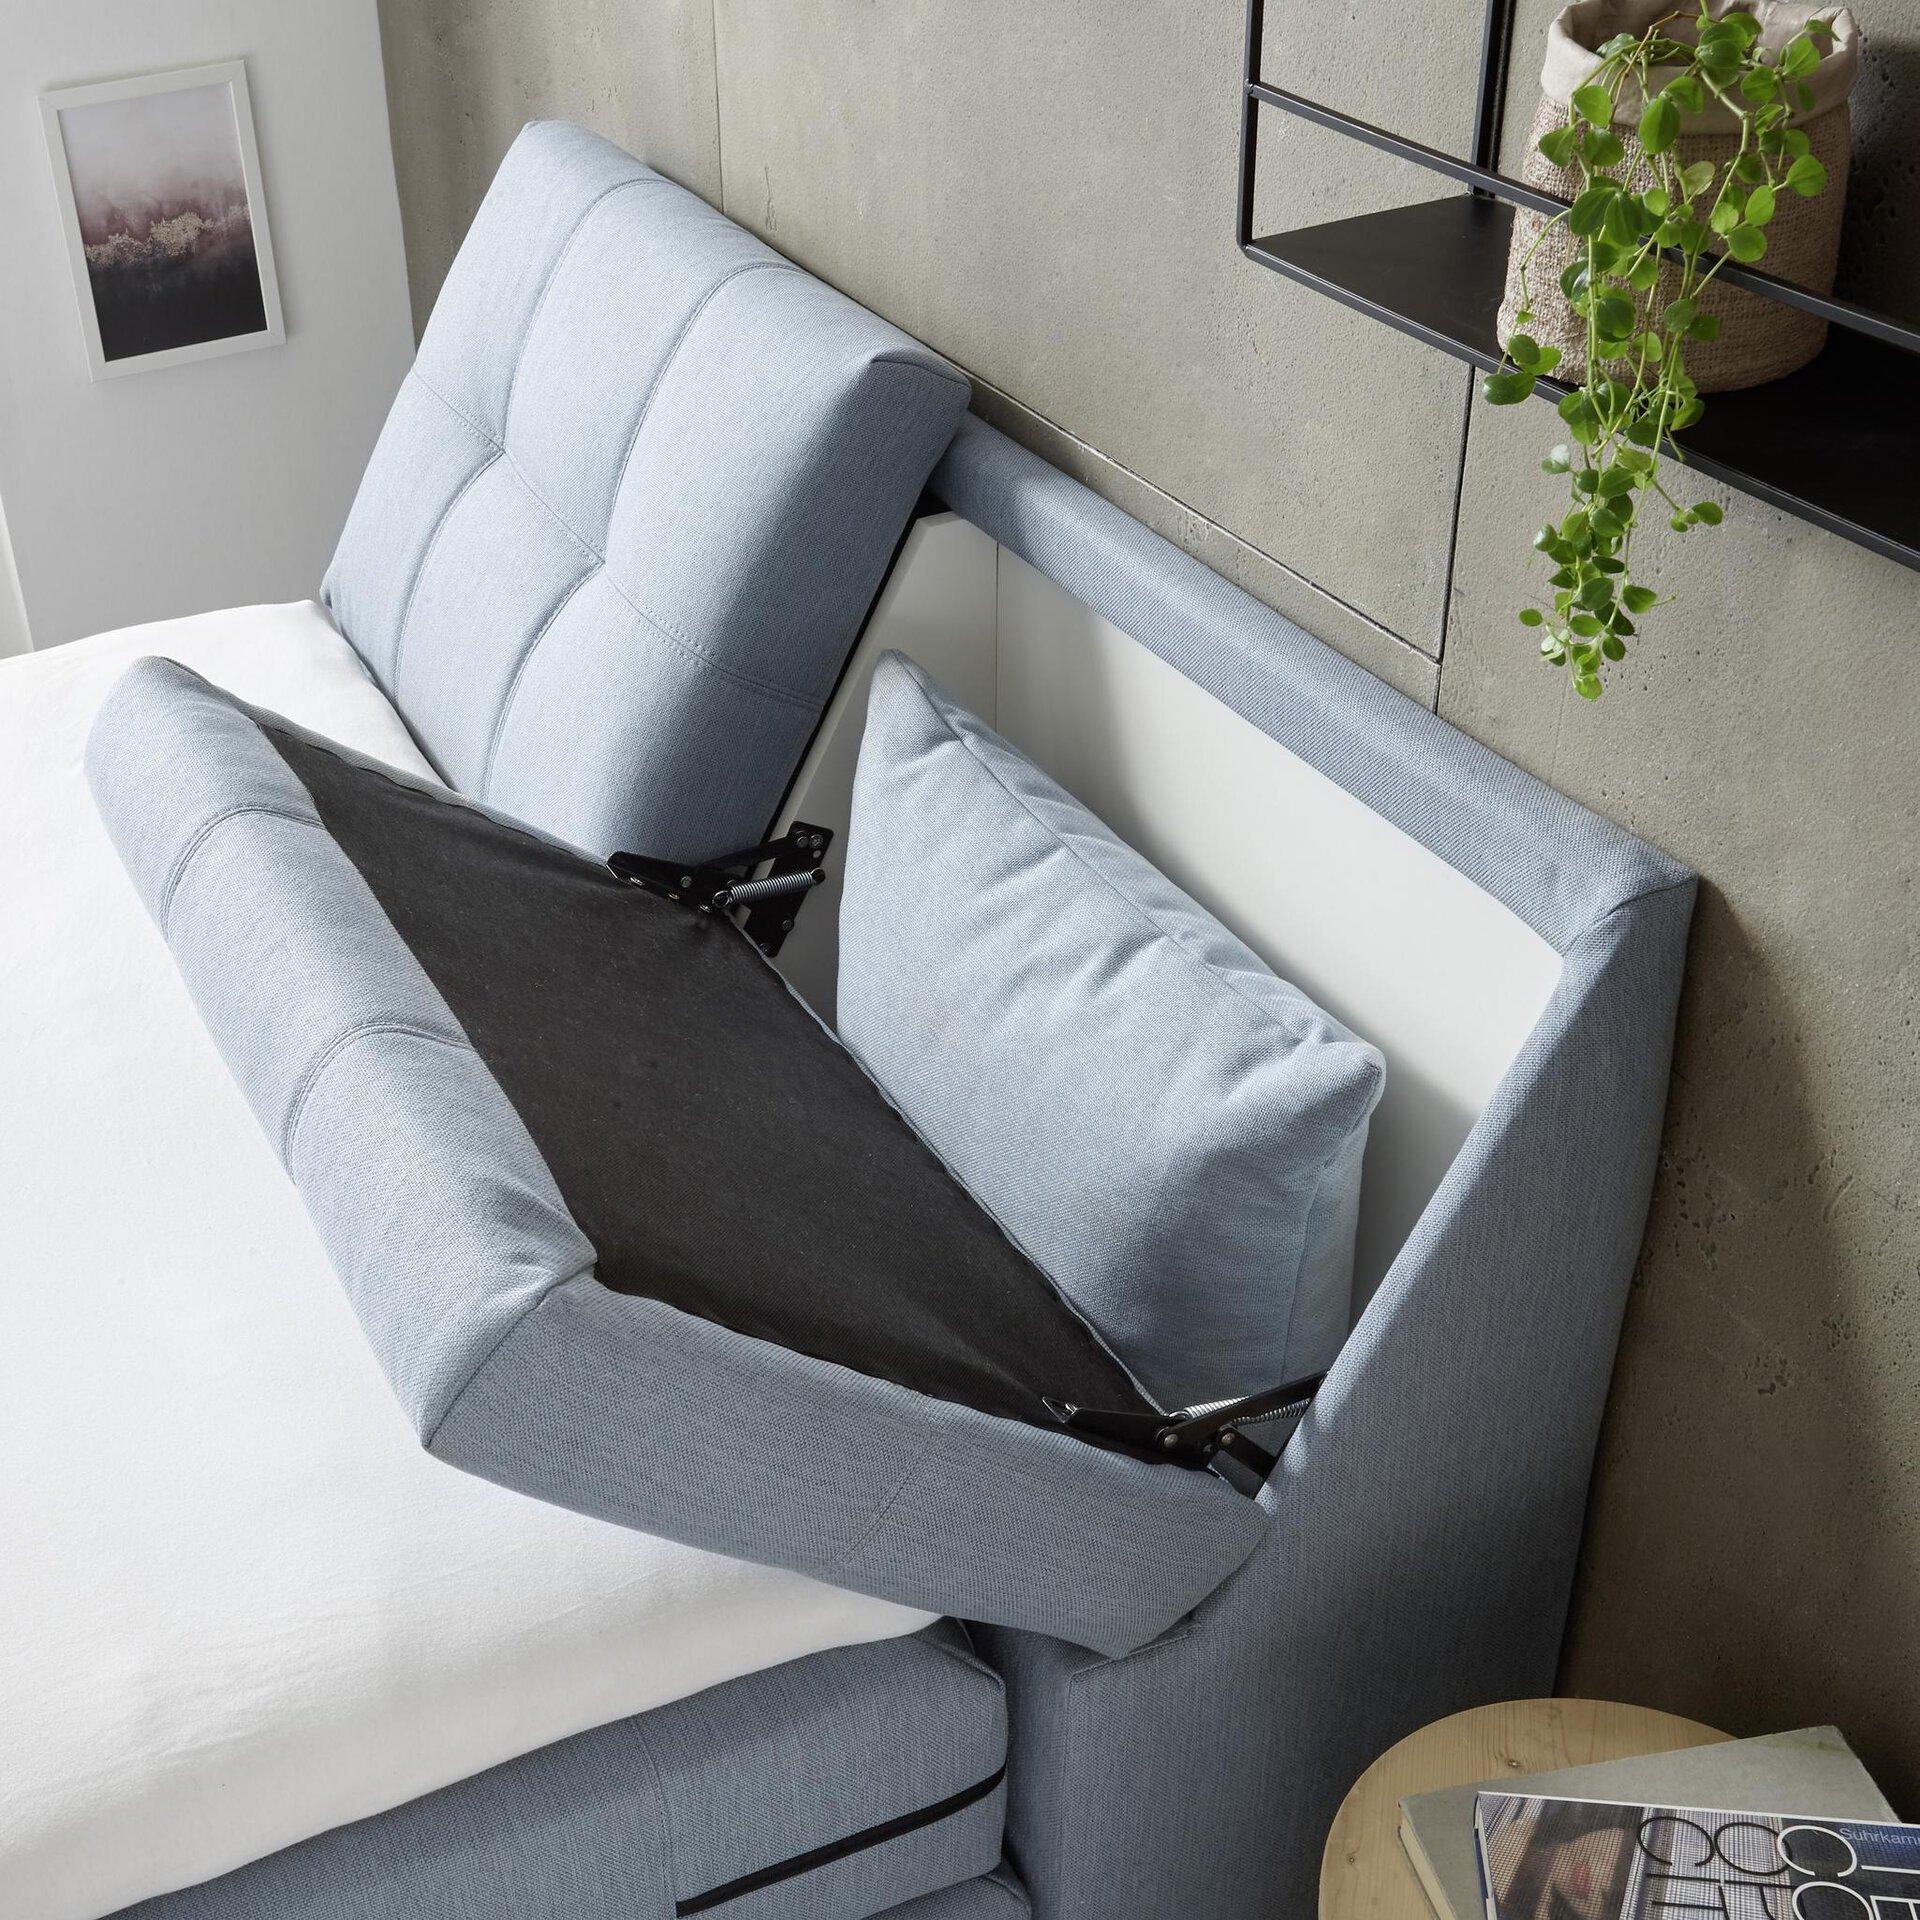 Boxspringbett MEMPHIS set One by Musterring Textil Blau 141 x 105 x 235 cm